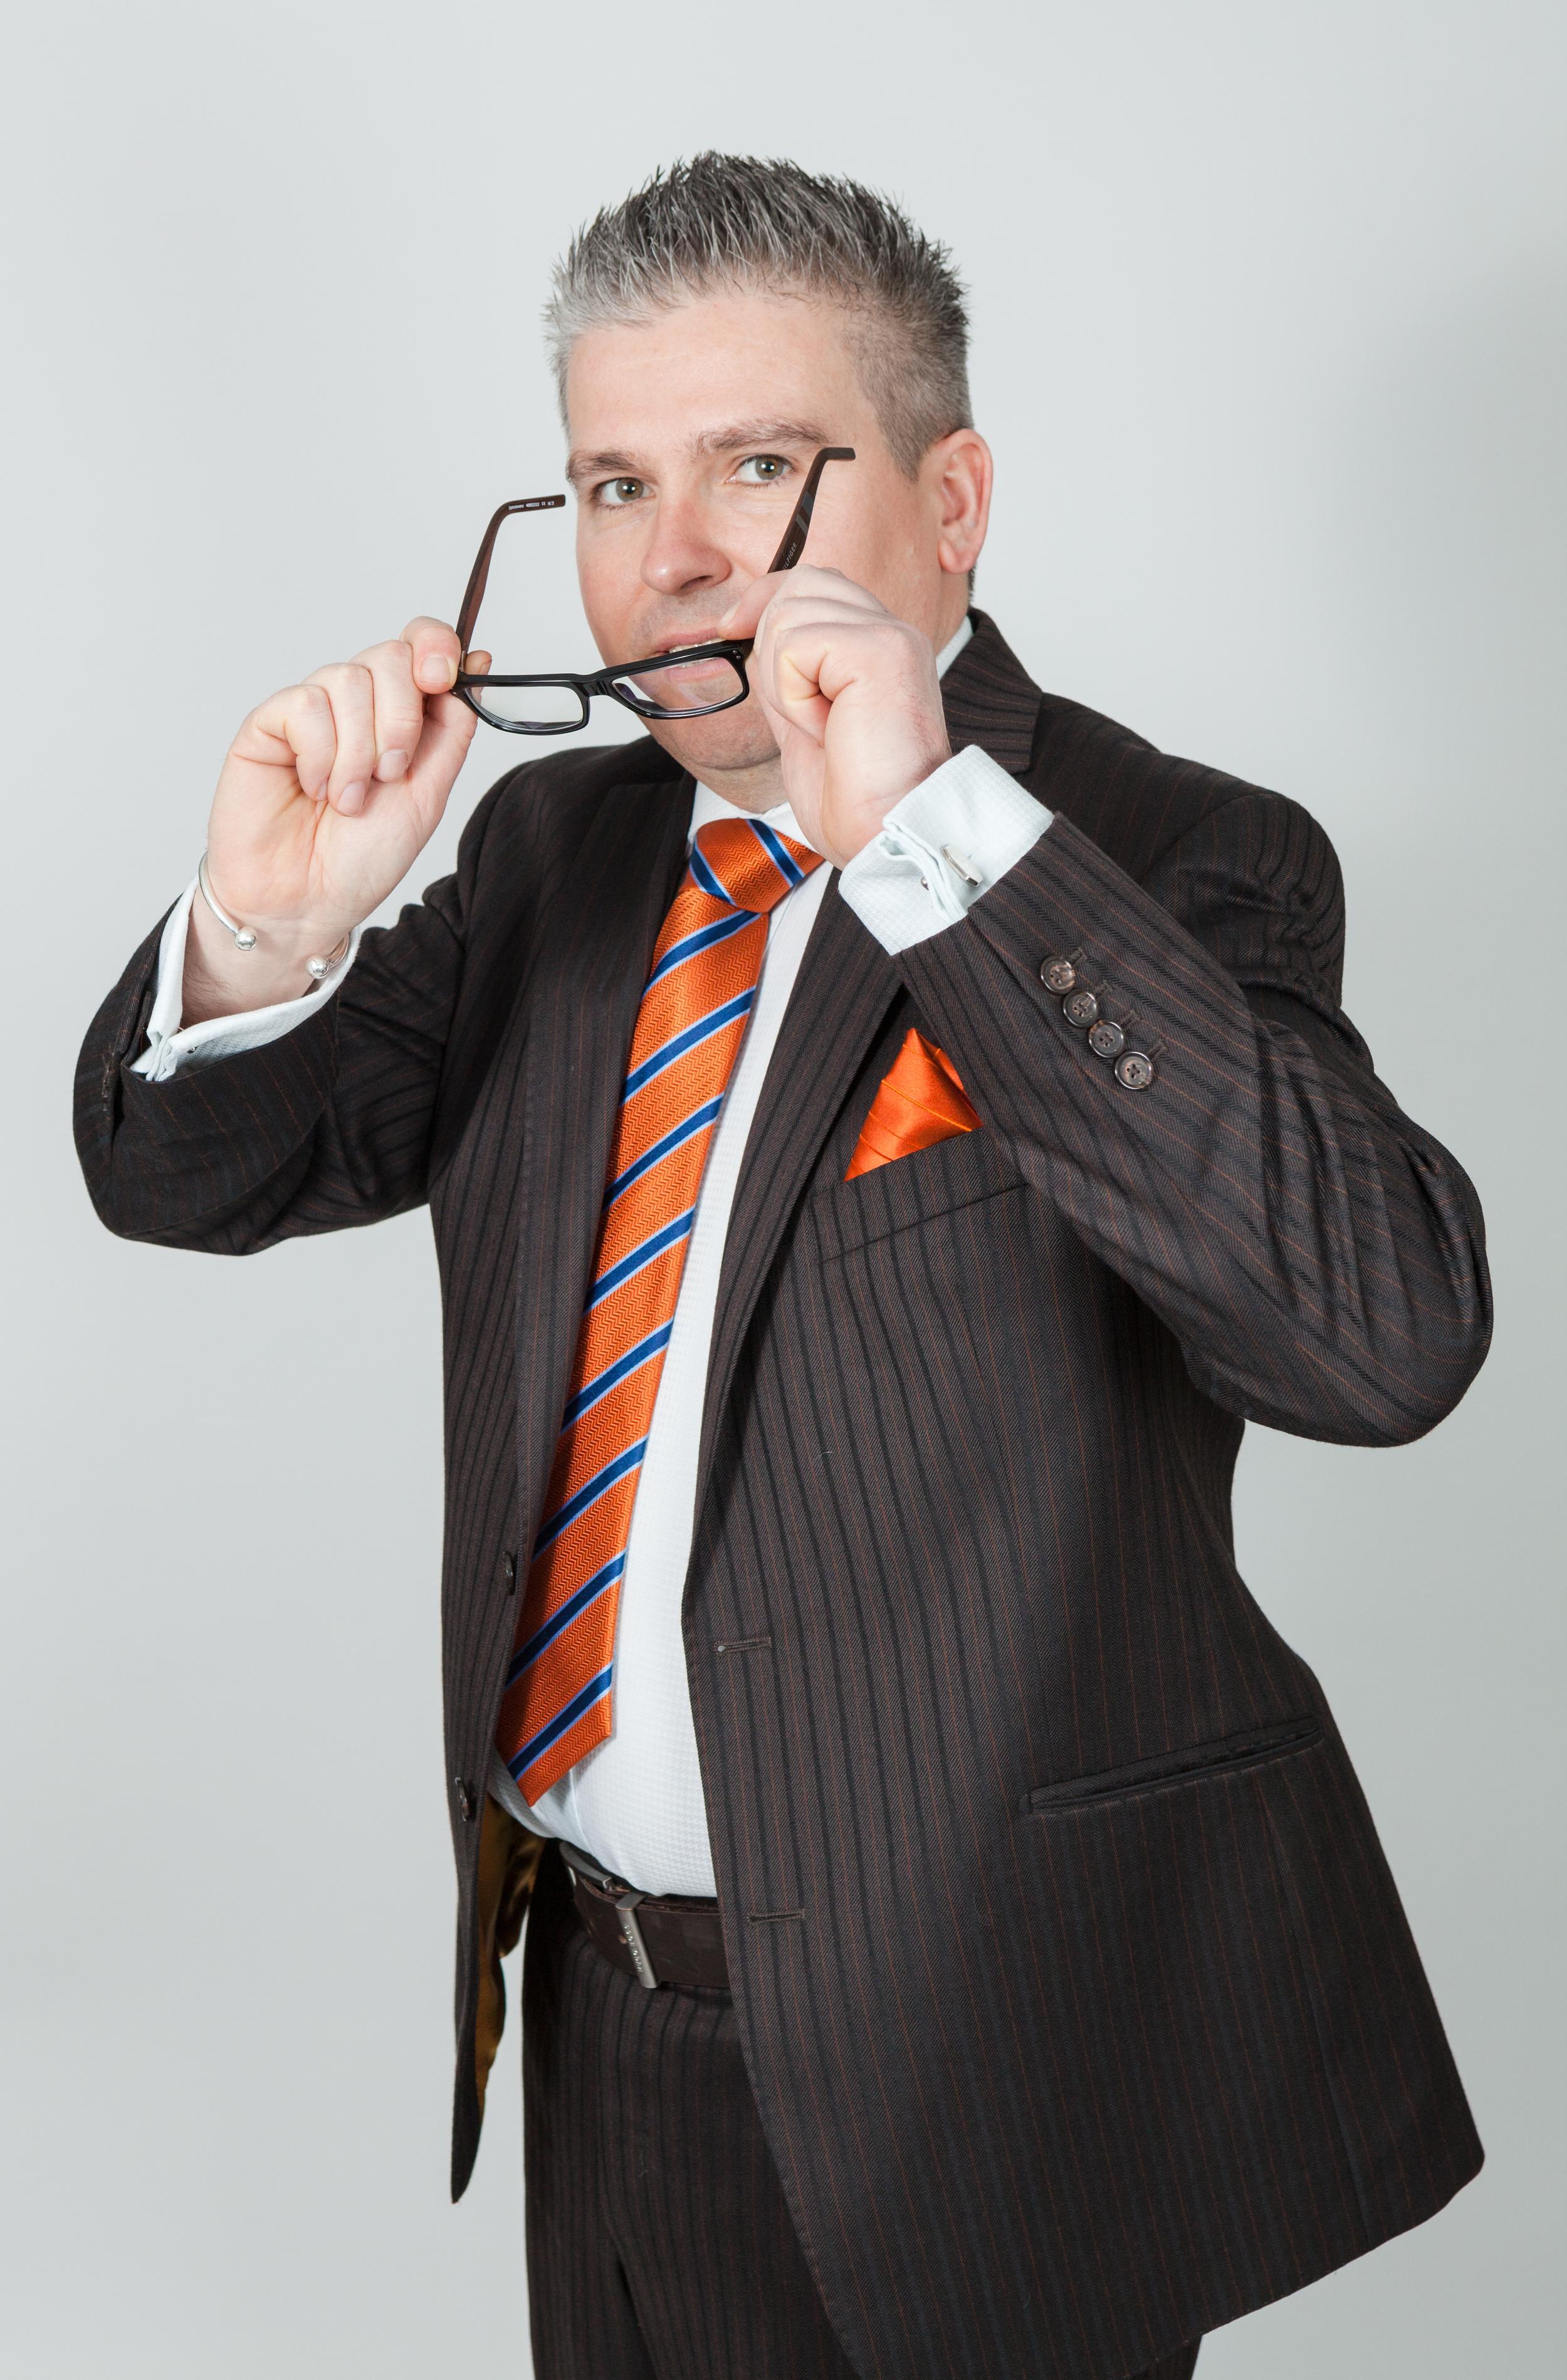 Dave Brown Suit- Glasses completley off_SimbocLtd_6953.jpg